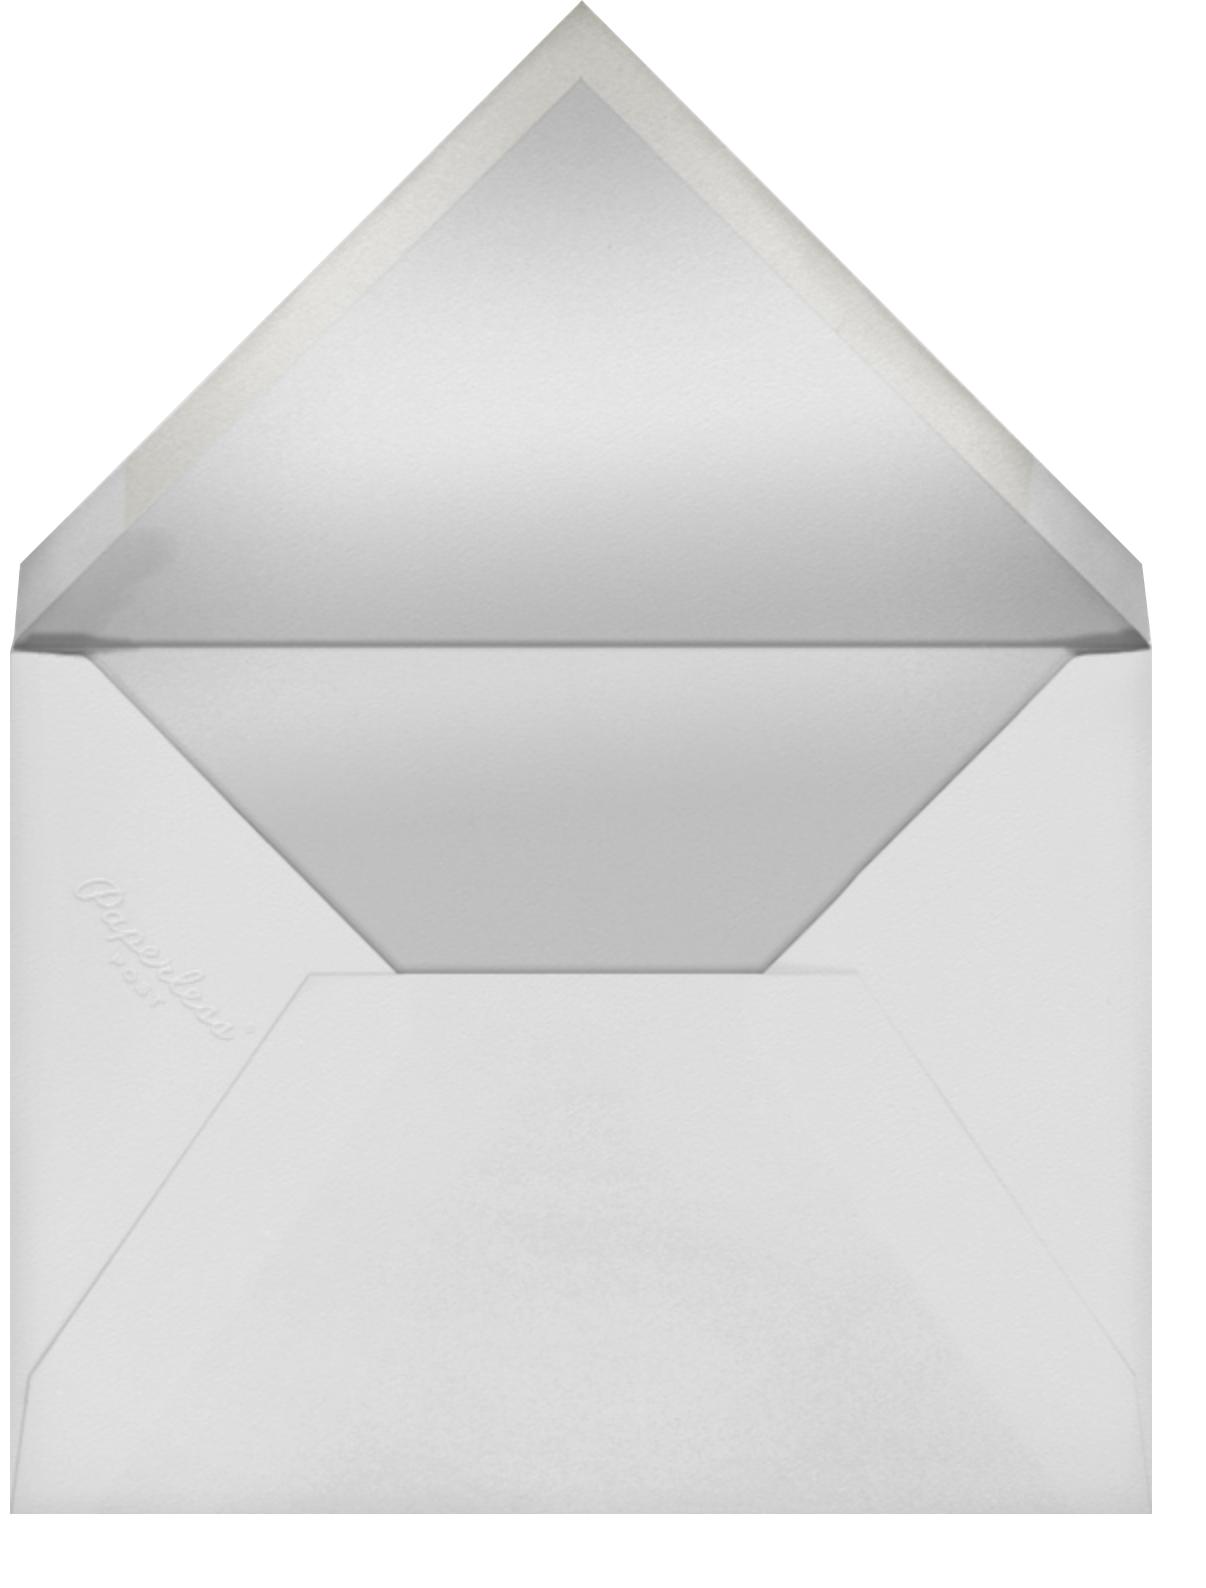 Cadogan (Crimson) - Paperless Post - Envelope